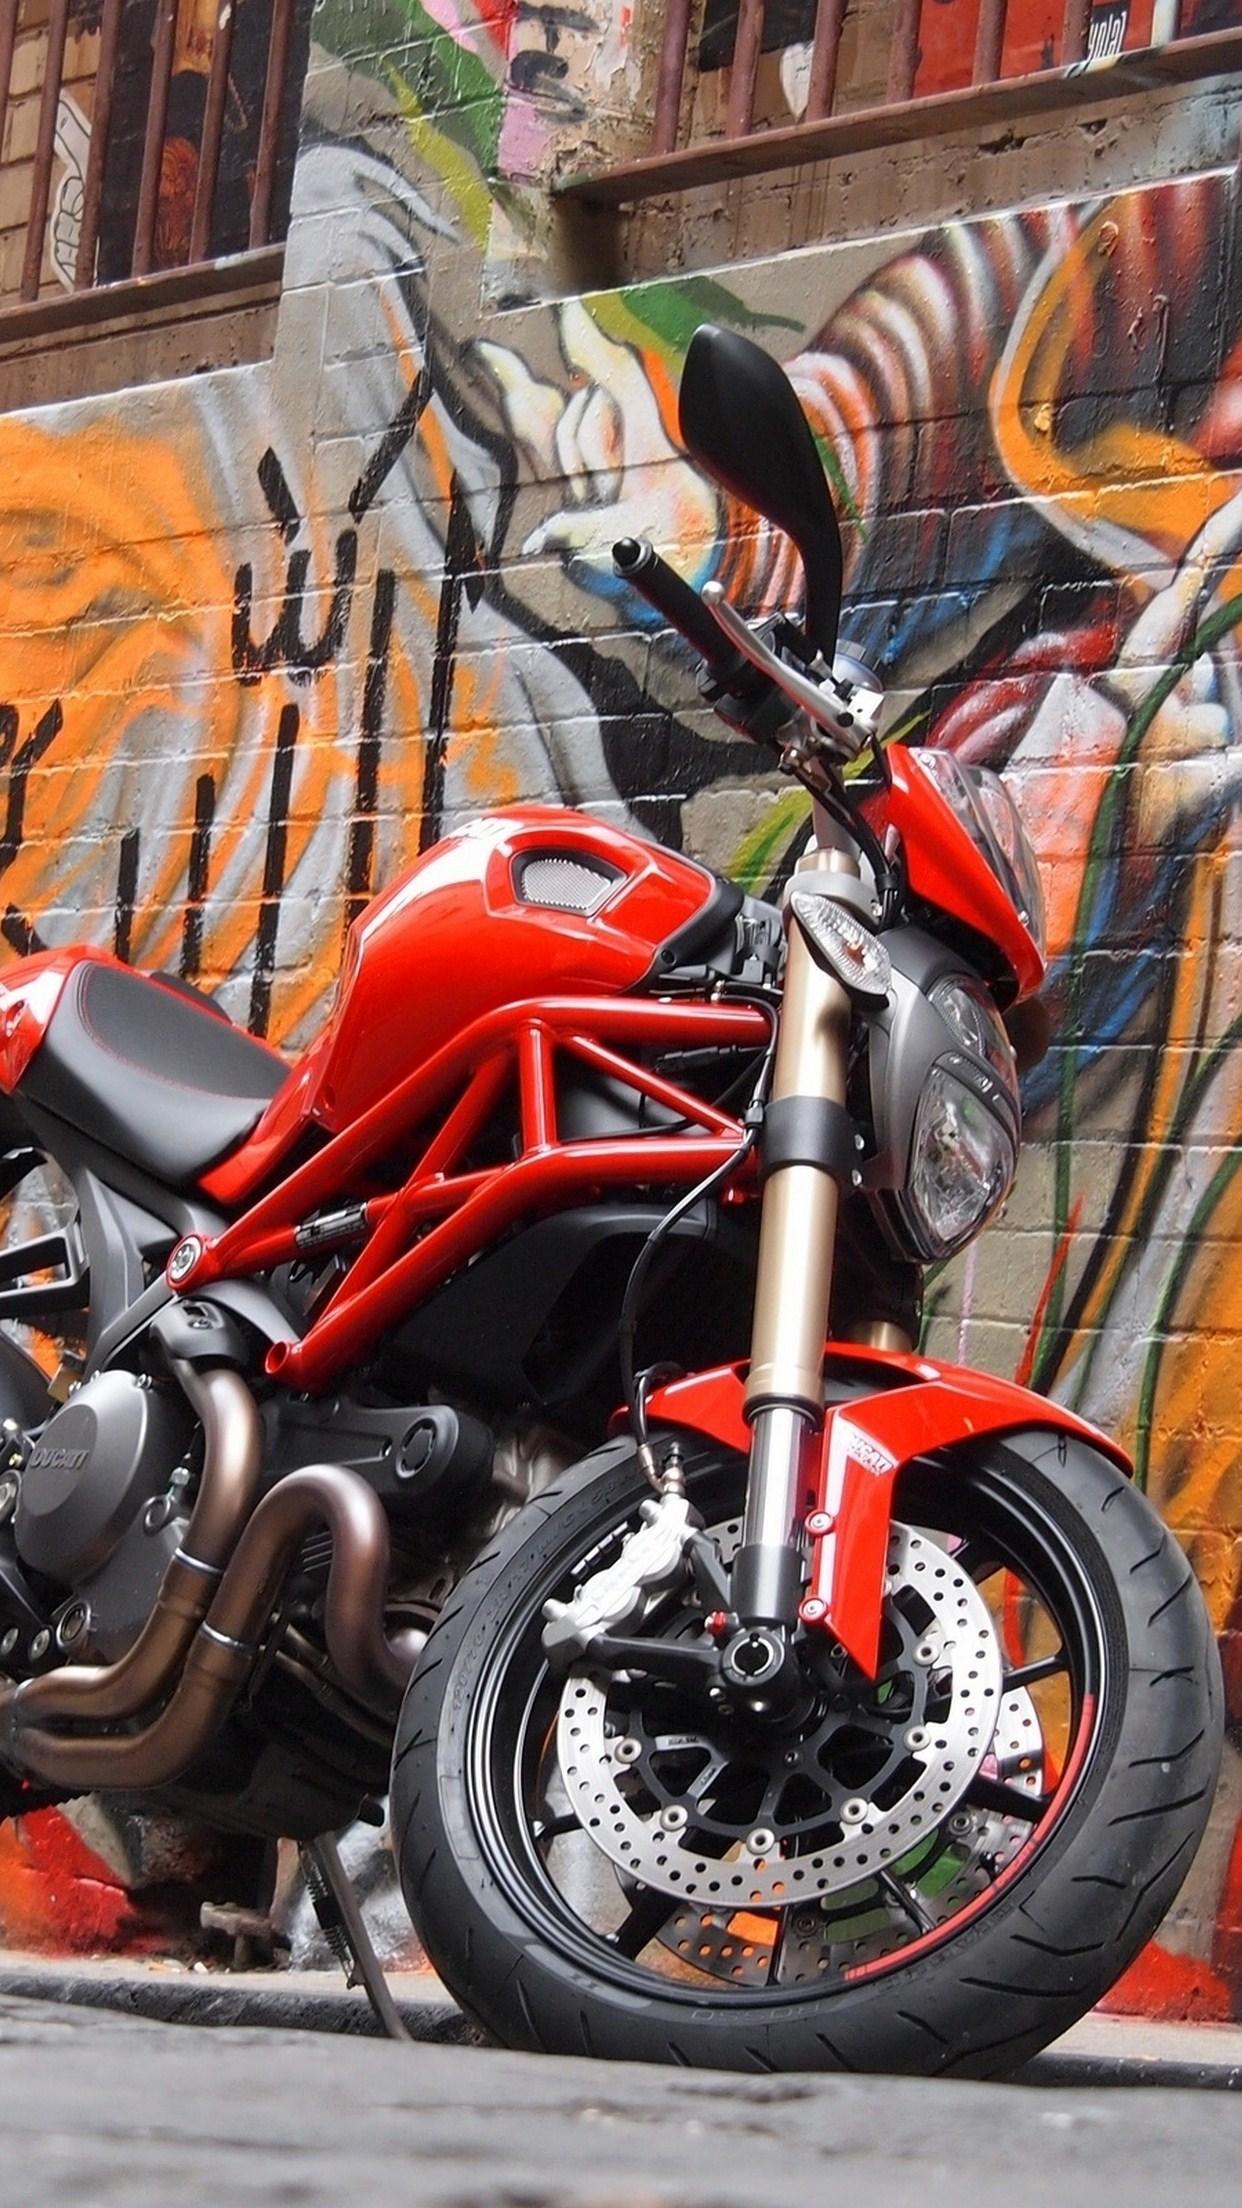 moto graffiti 3Wallpapers iPhone Parallax Moto Graffiti